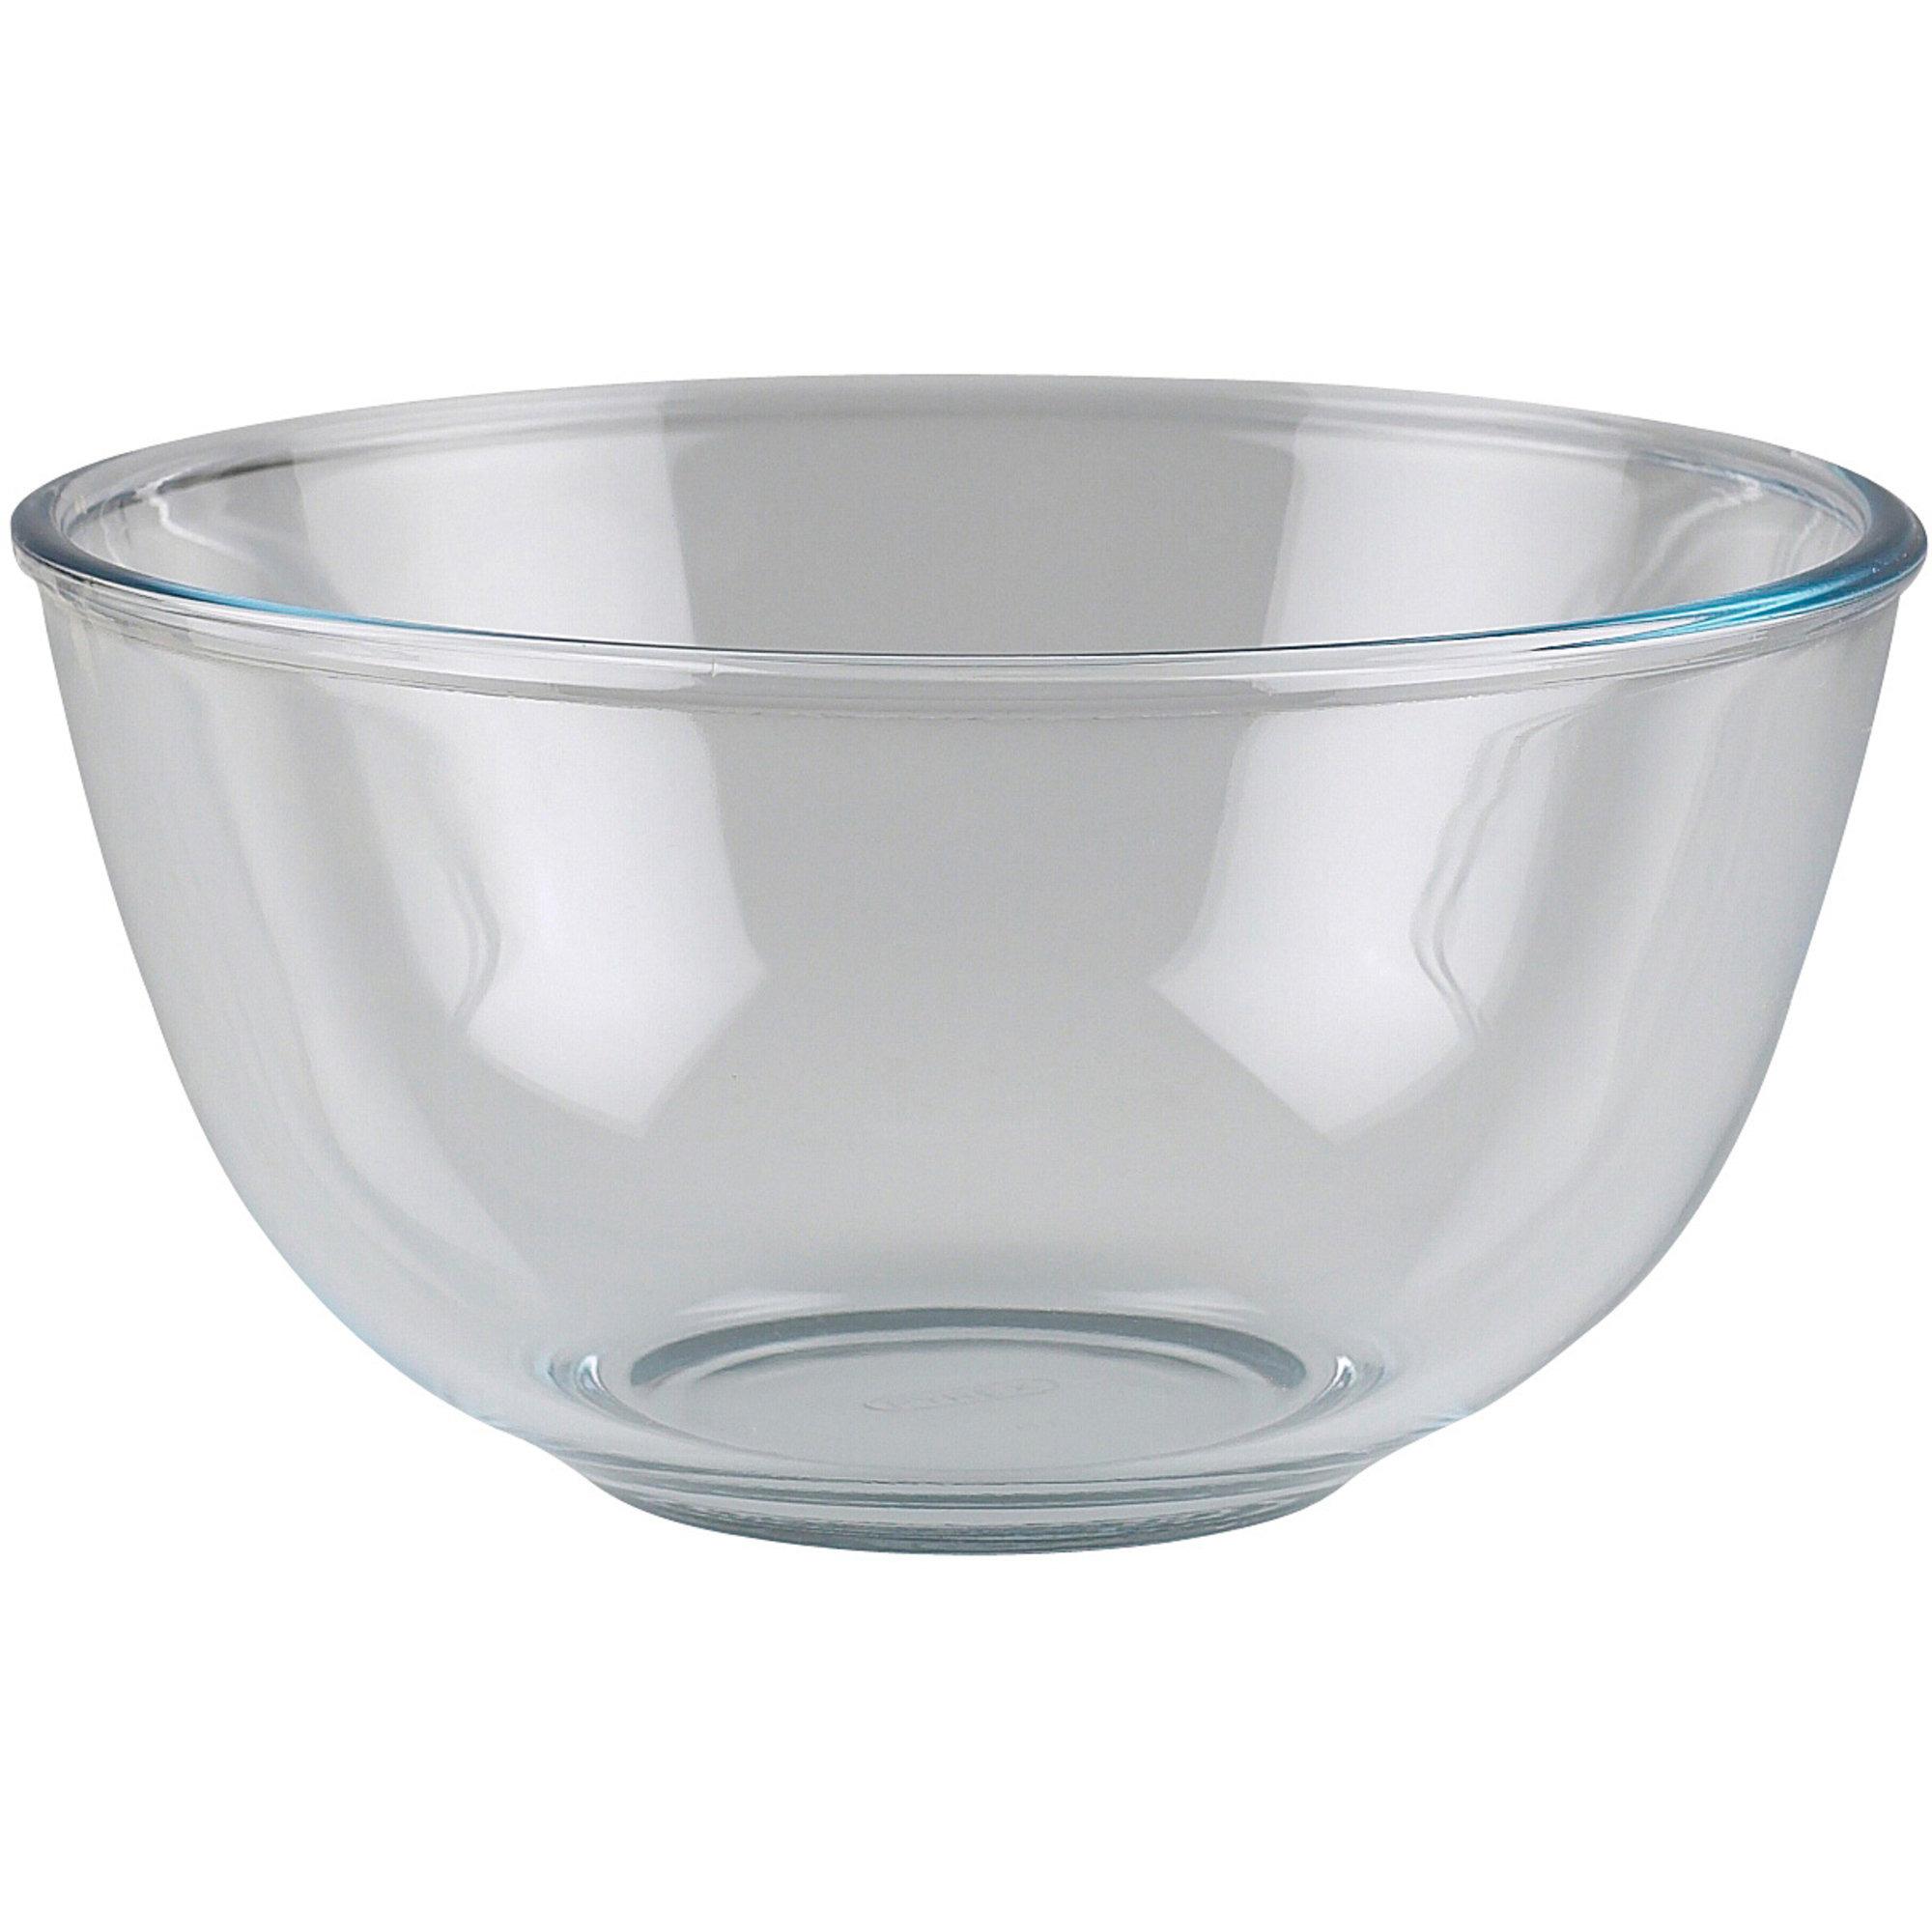 Pyrex Glasskål 2 liter